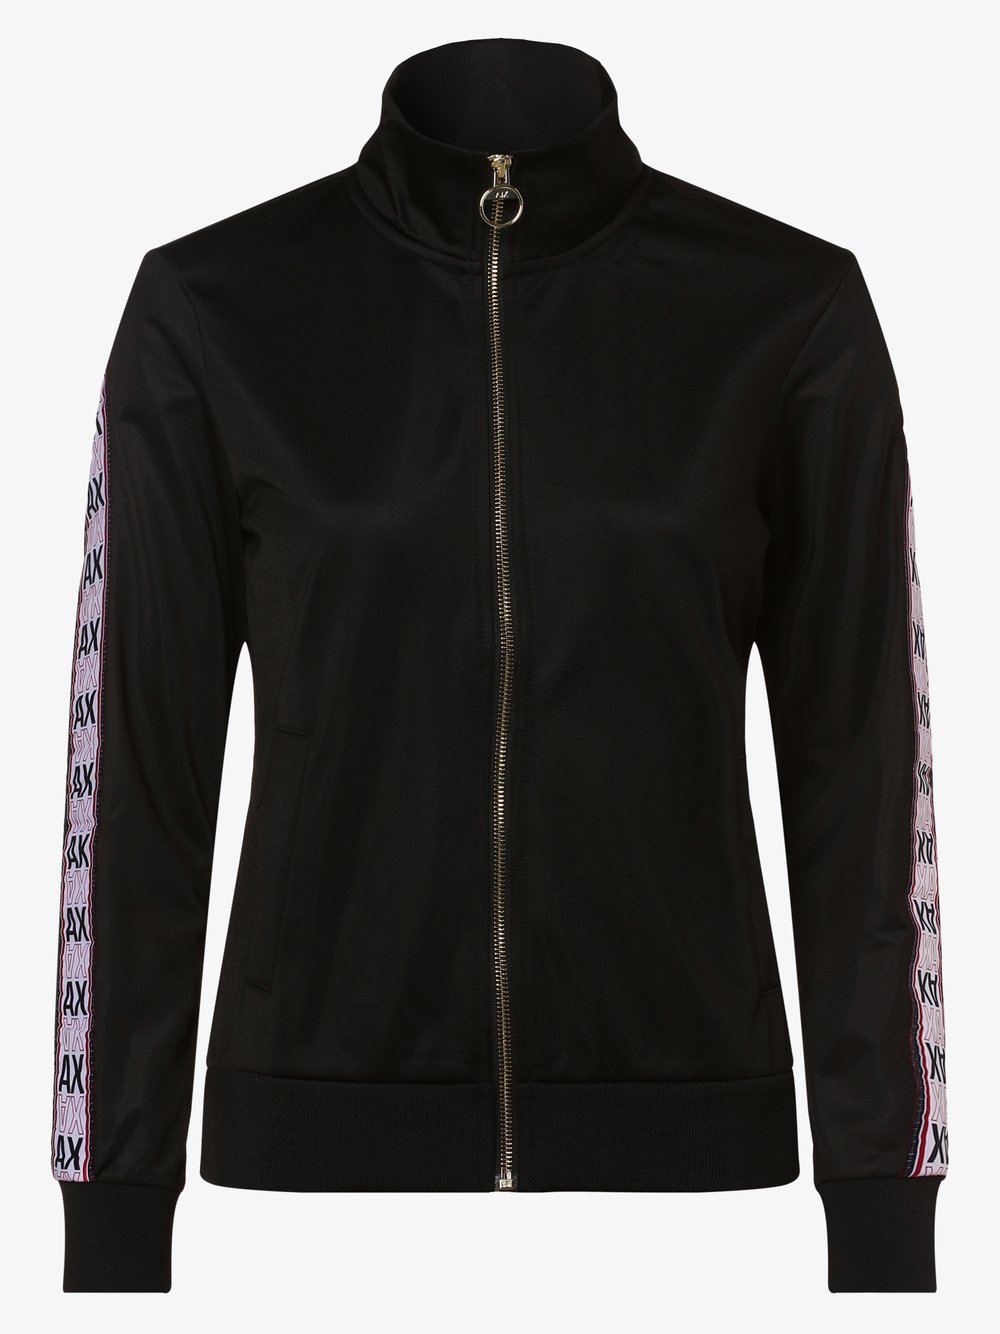 Armani Exchange - Damska bluza rozpinana, czarny